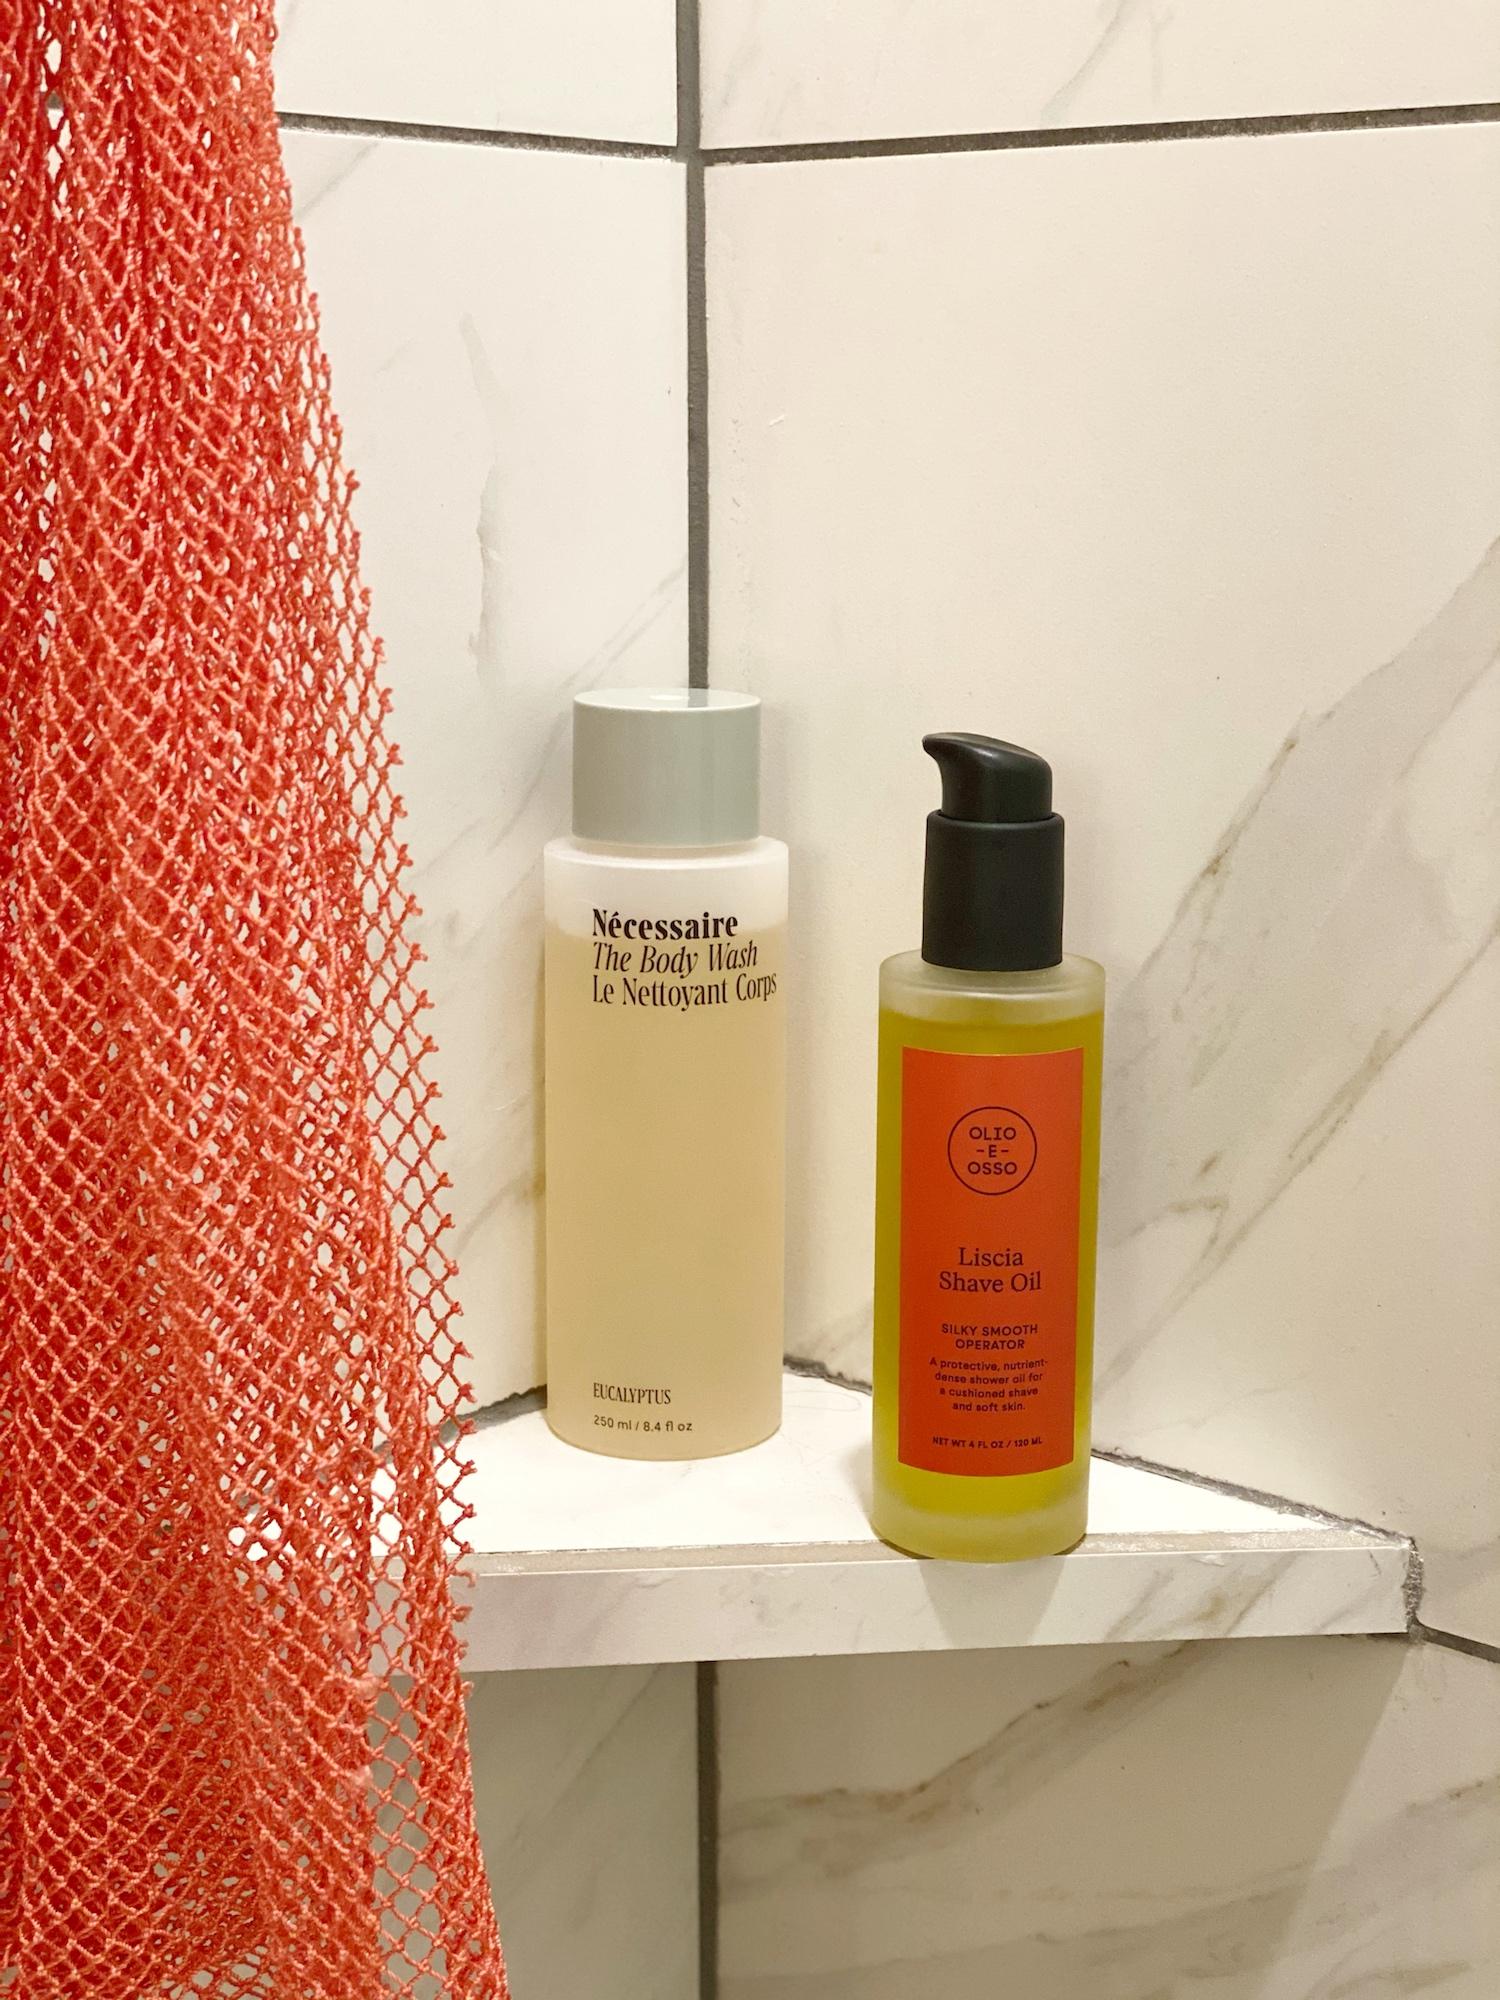 shave oil from Olio e Osso